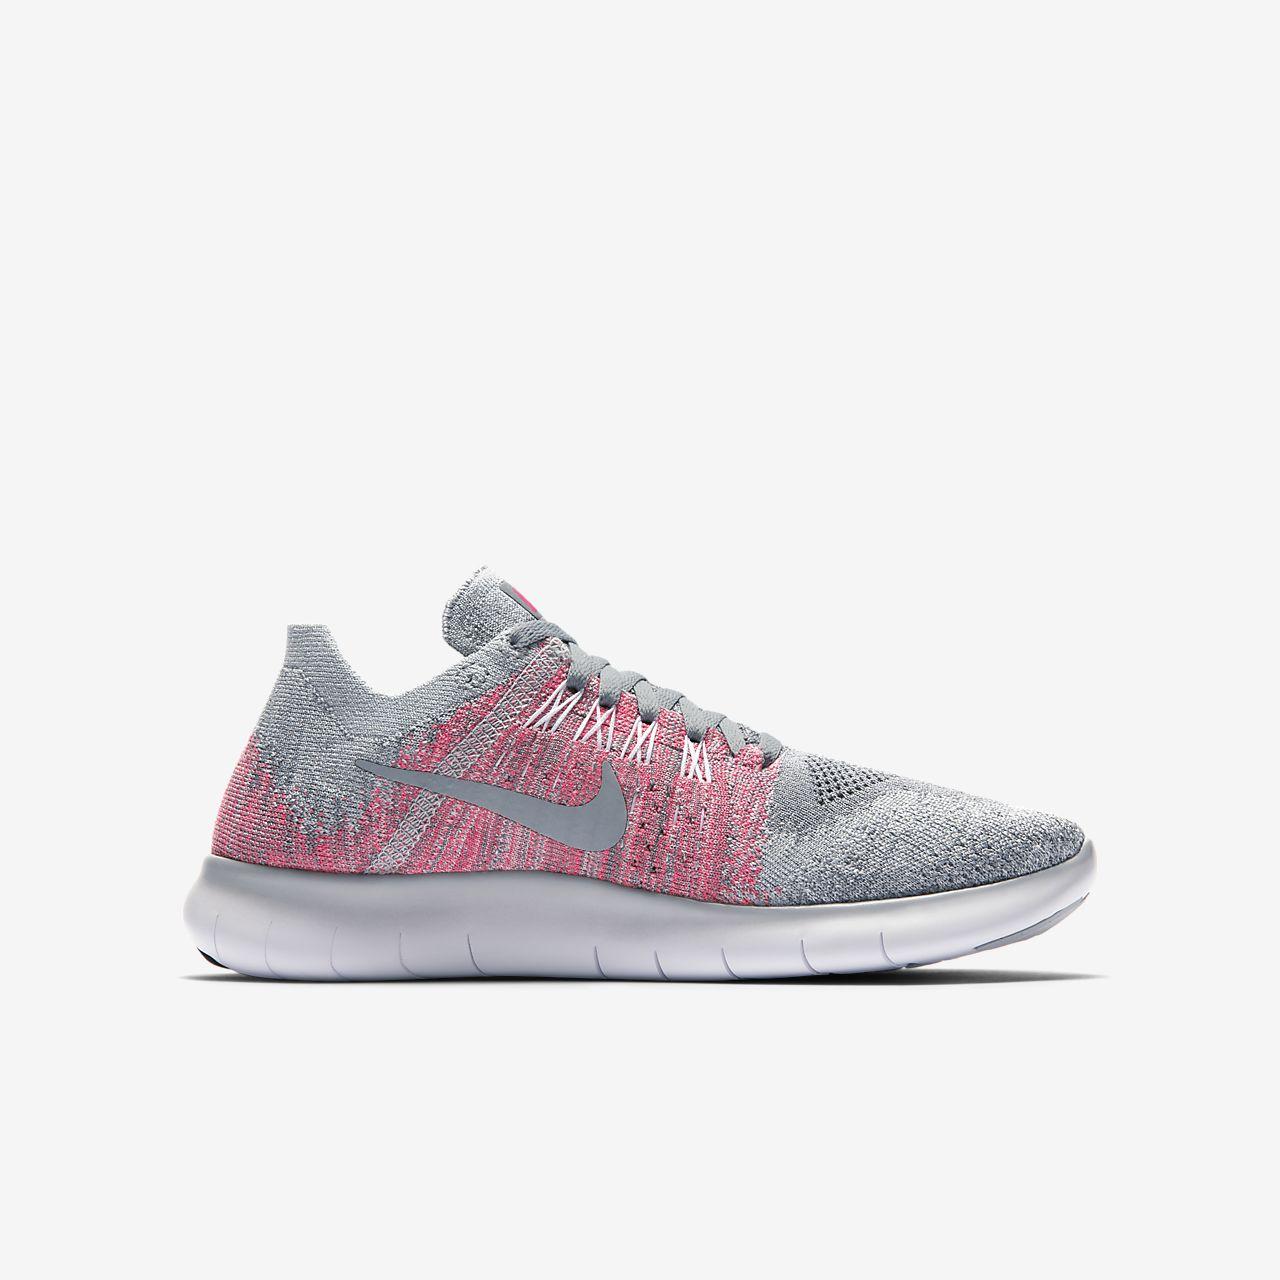 ... Nike Free RN Flyknit 2017 Older Kids' Running Shoe